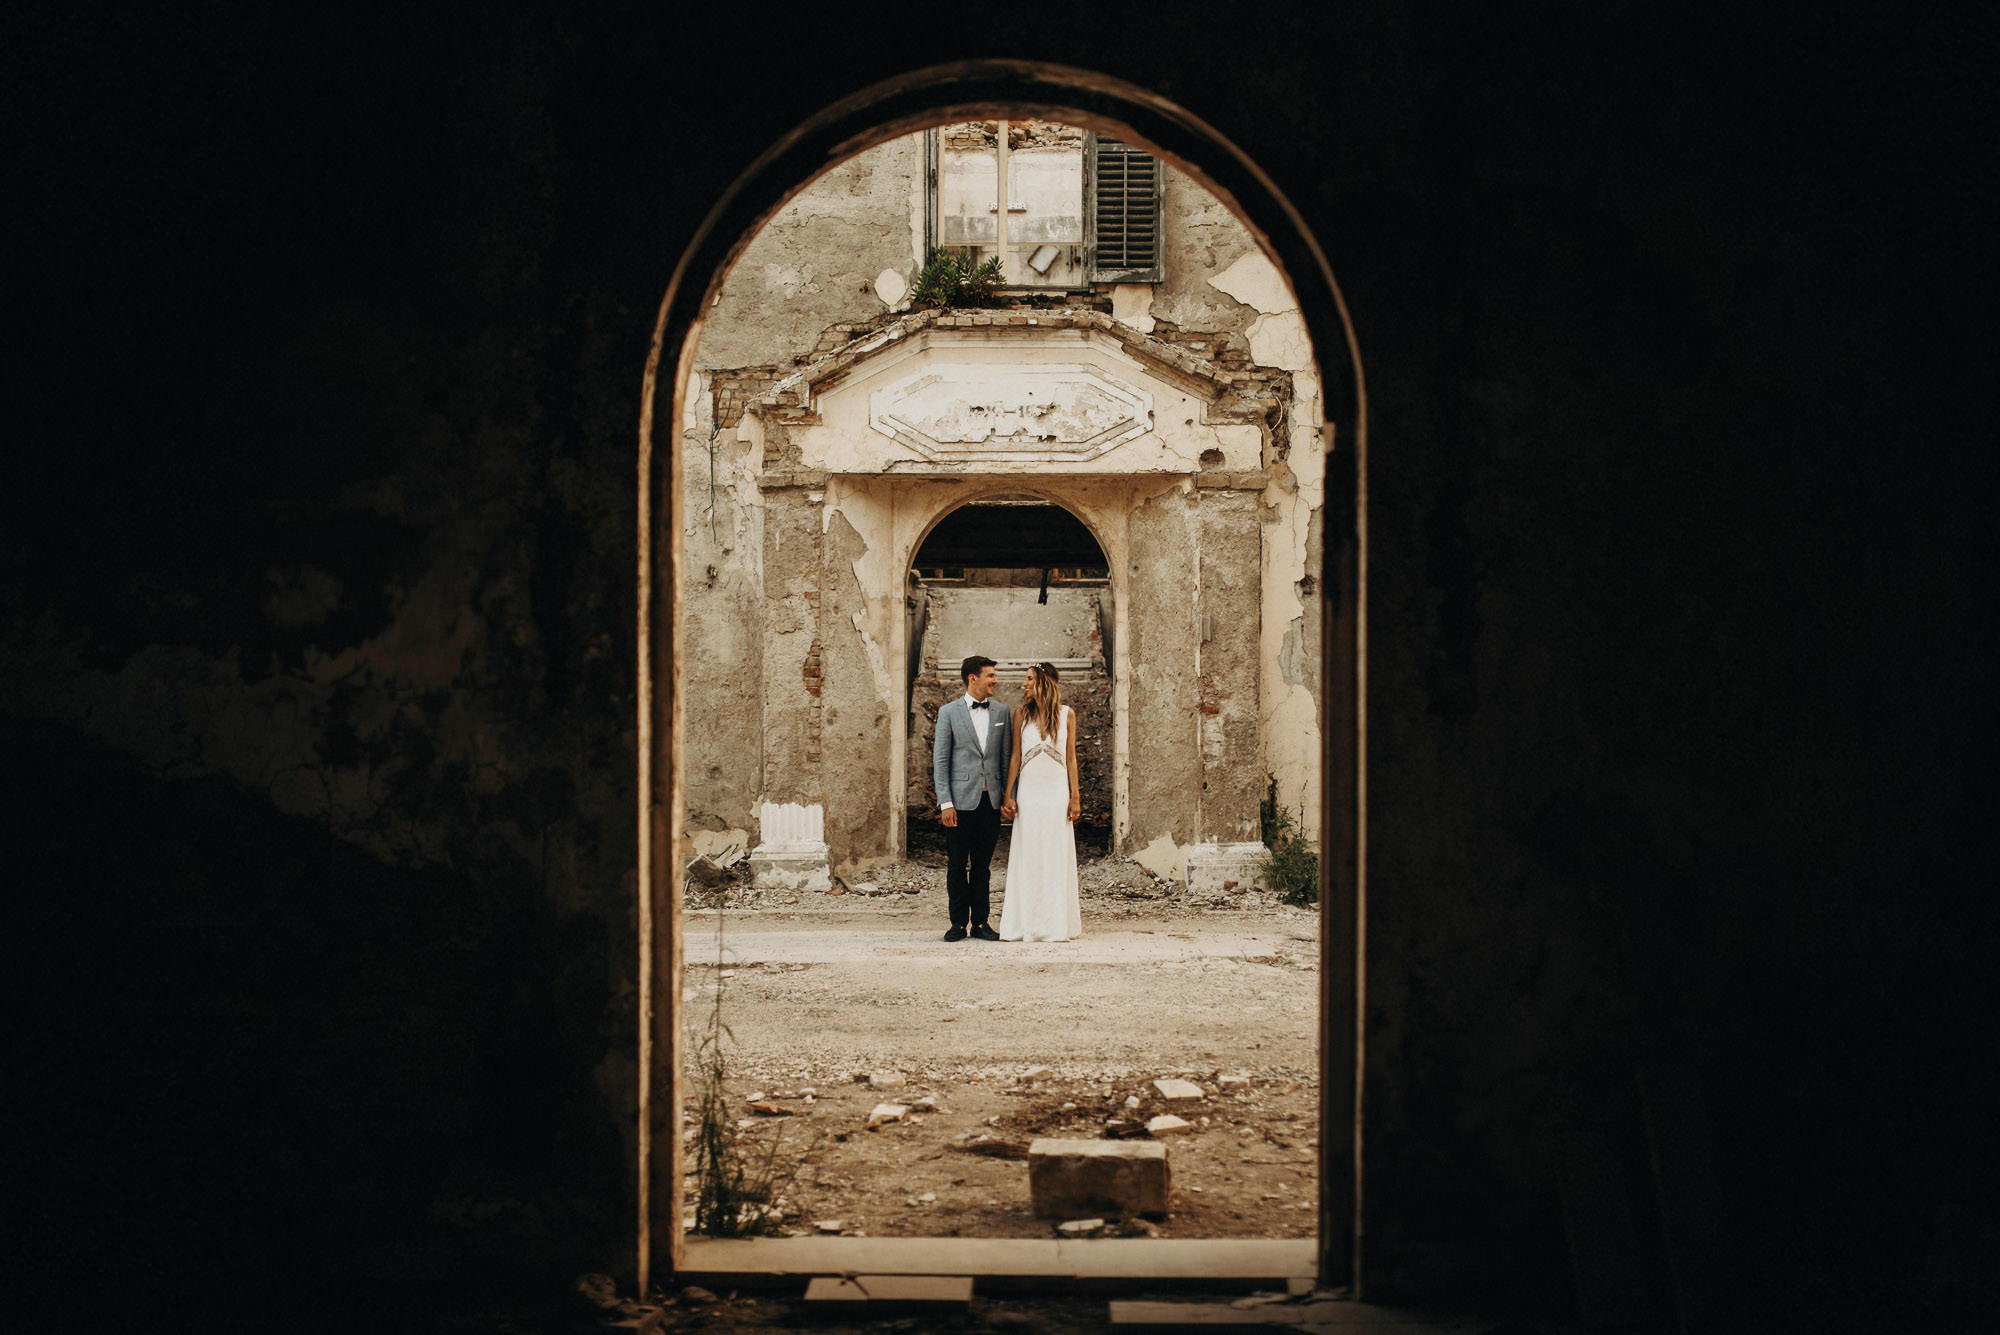 dubrovnik_croatia_wedding_photographer-jere_satamo-destination_weddings-108-web.jpg